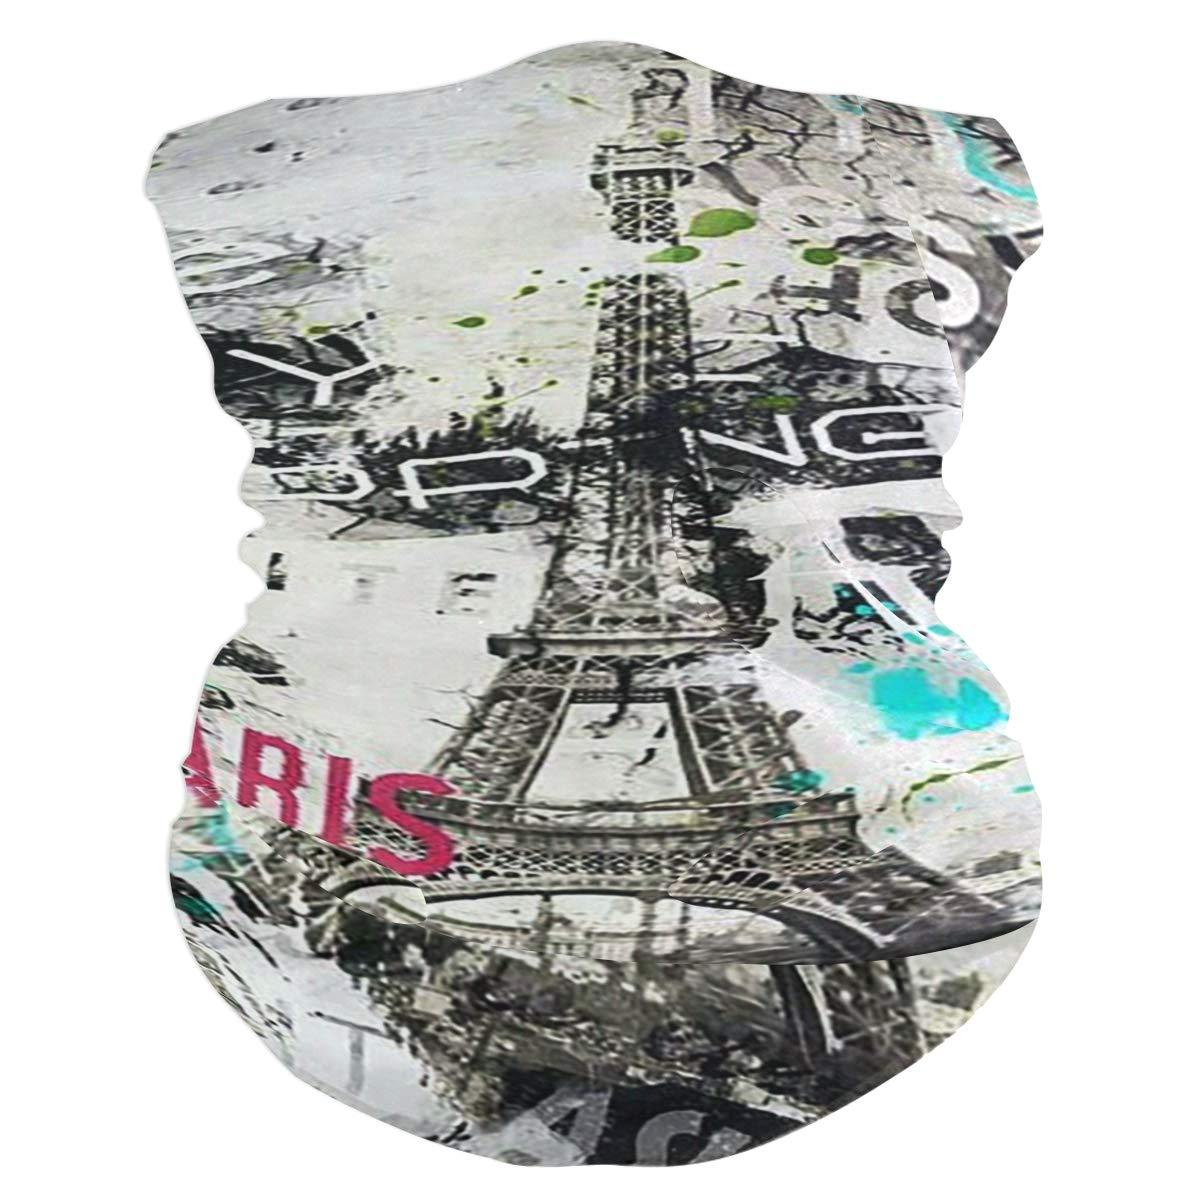 SLHFPX Paris Eiffel Tower France Love Romantic Country Headband WoBandana Balaclava,Neck Warmer,Face Mask,Neckerchief Hatliner